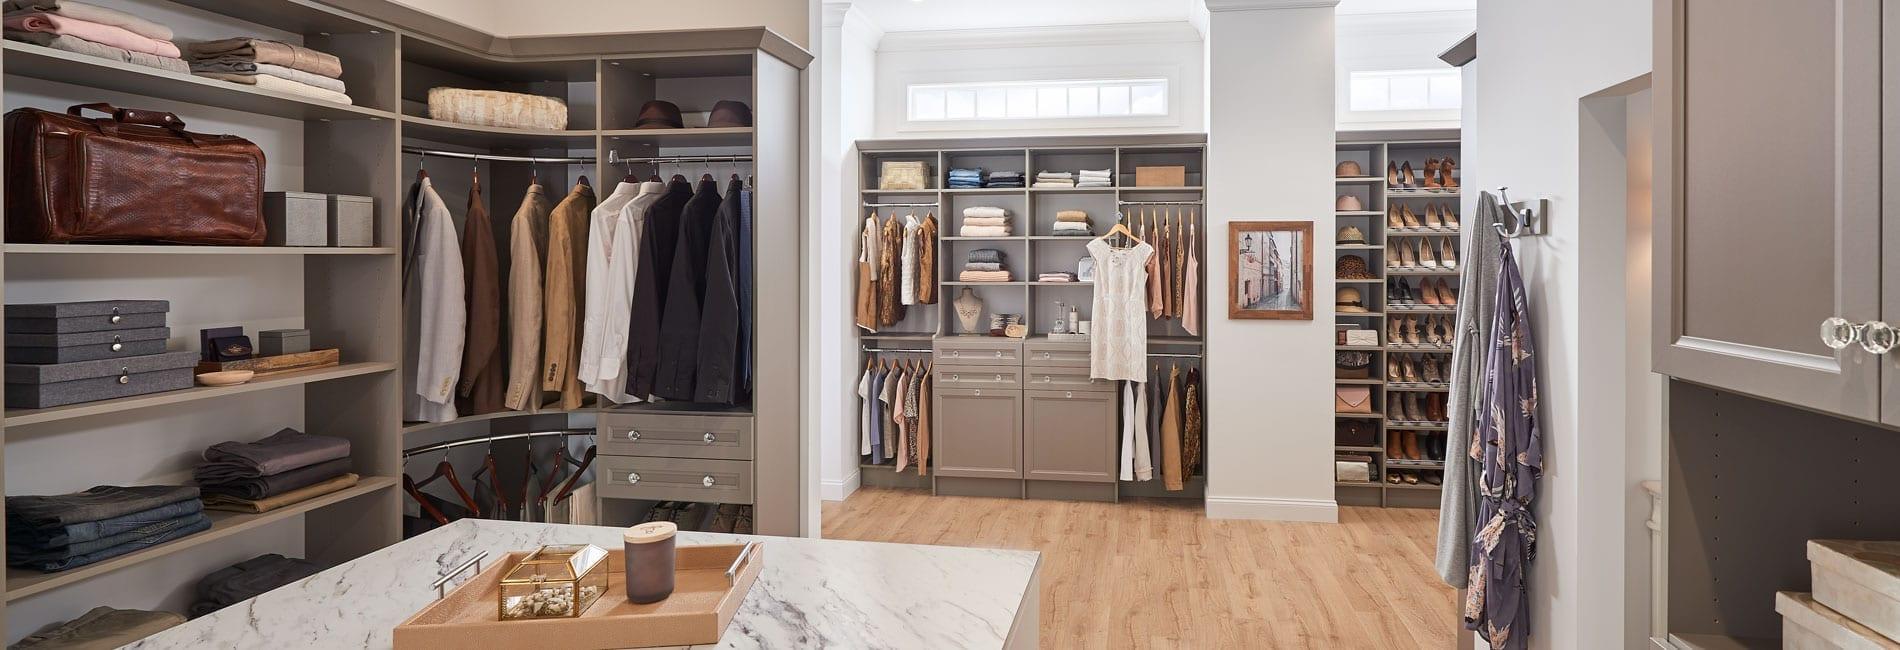 Plentiful Storage Shelves